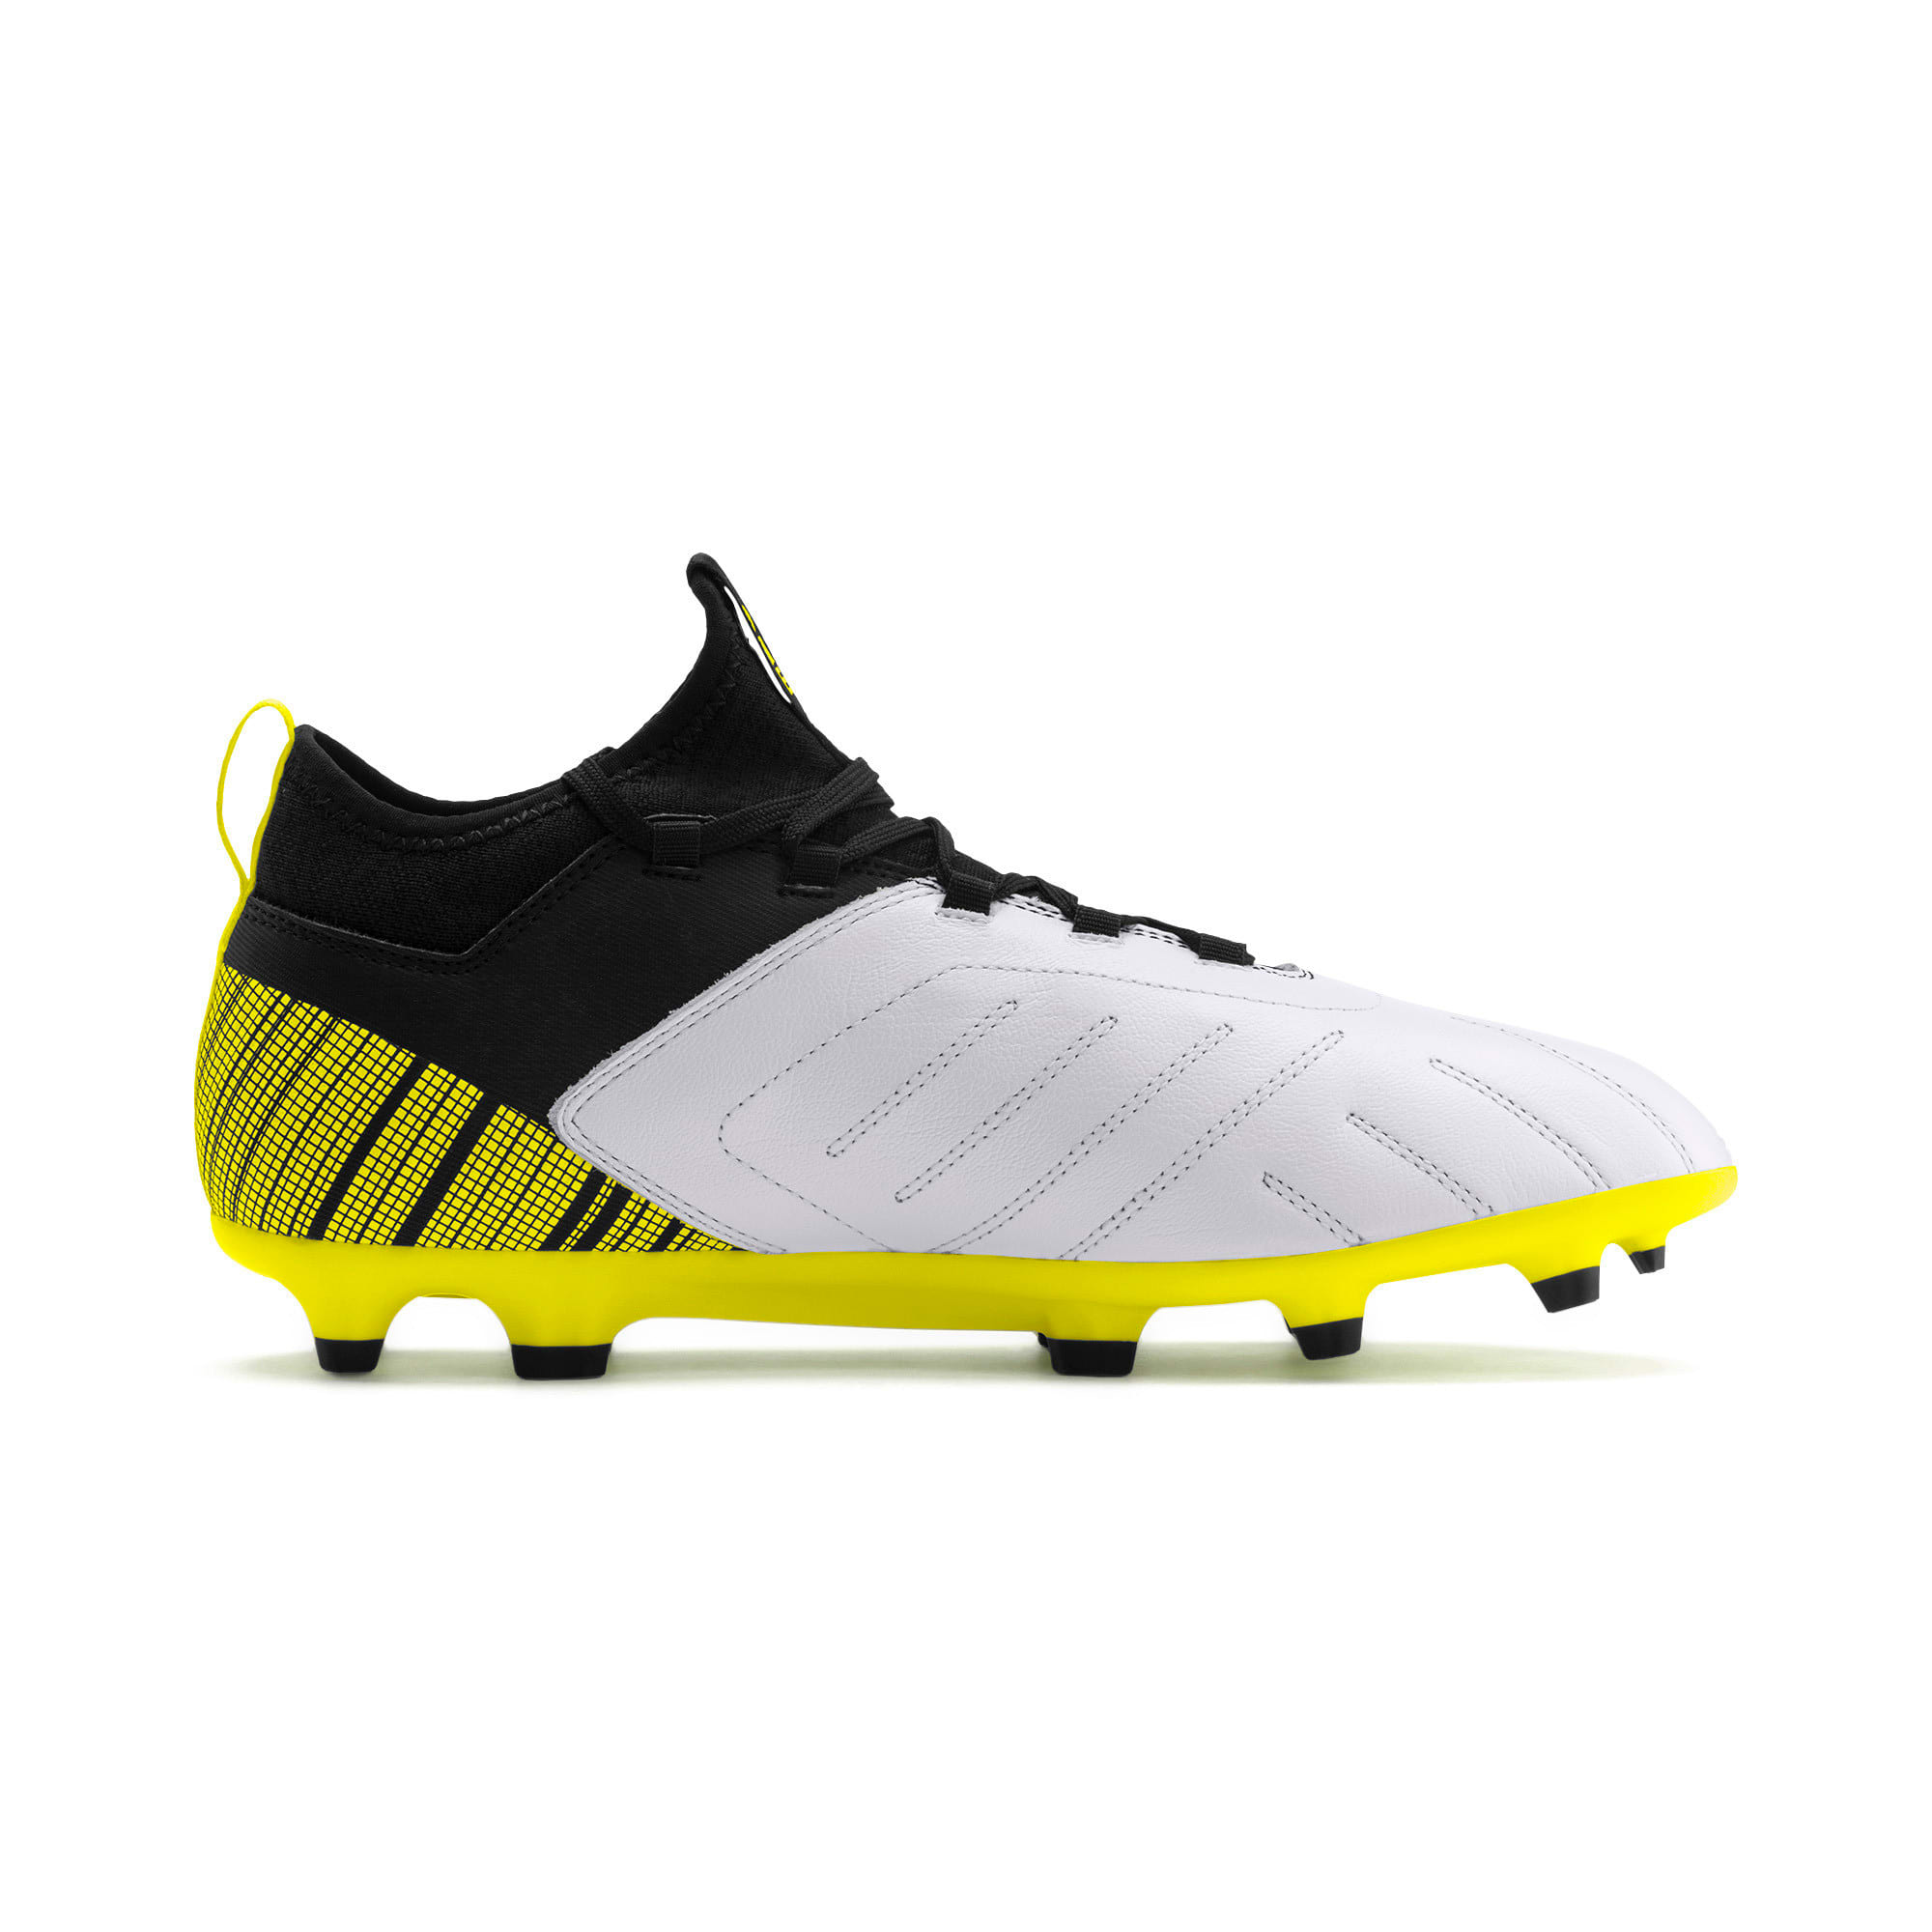 Thumbnail 6 of PUMA ONE 5.3 FG/AG Men's Soccer Cleats, White-Black-Yellow Alert, medium